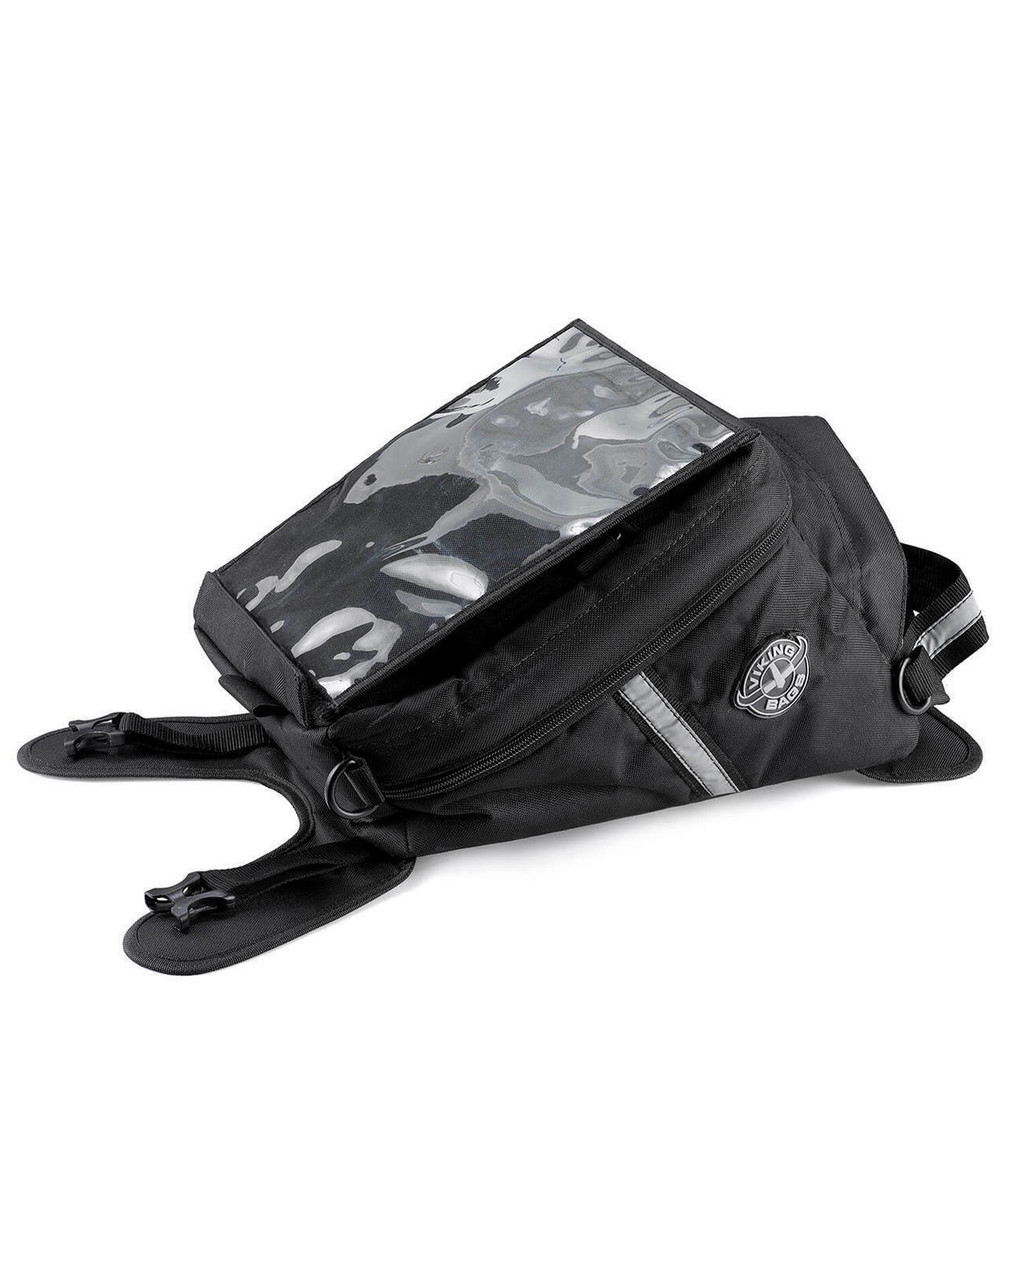 Viking Dirtman Medium Black Indian Motorcycle Tank Bag Main Bag View